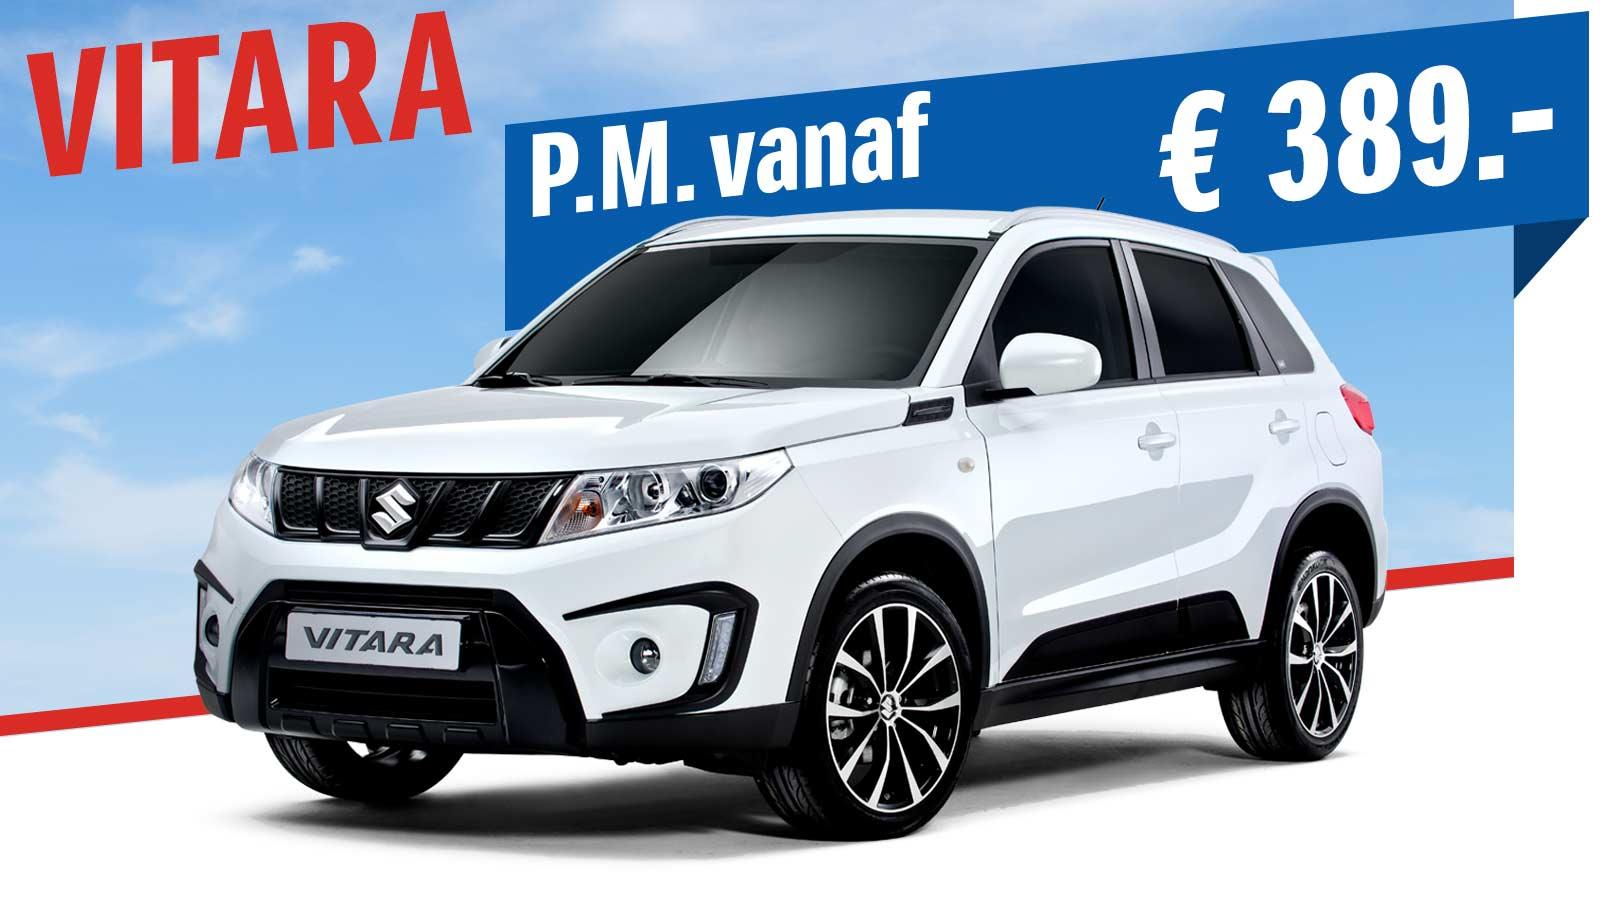 Suzuki Vitara Private Lease